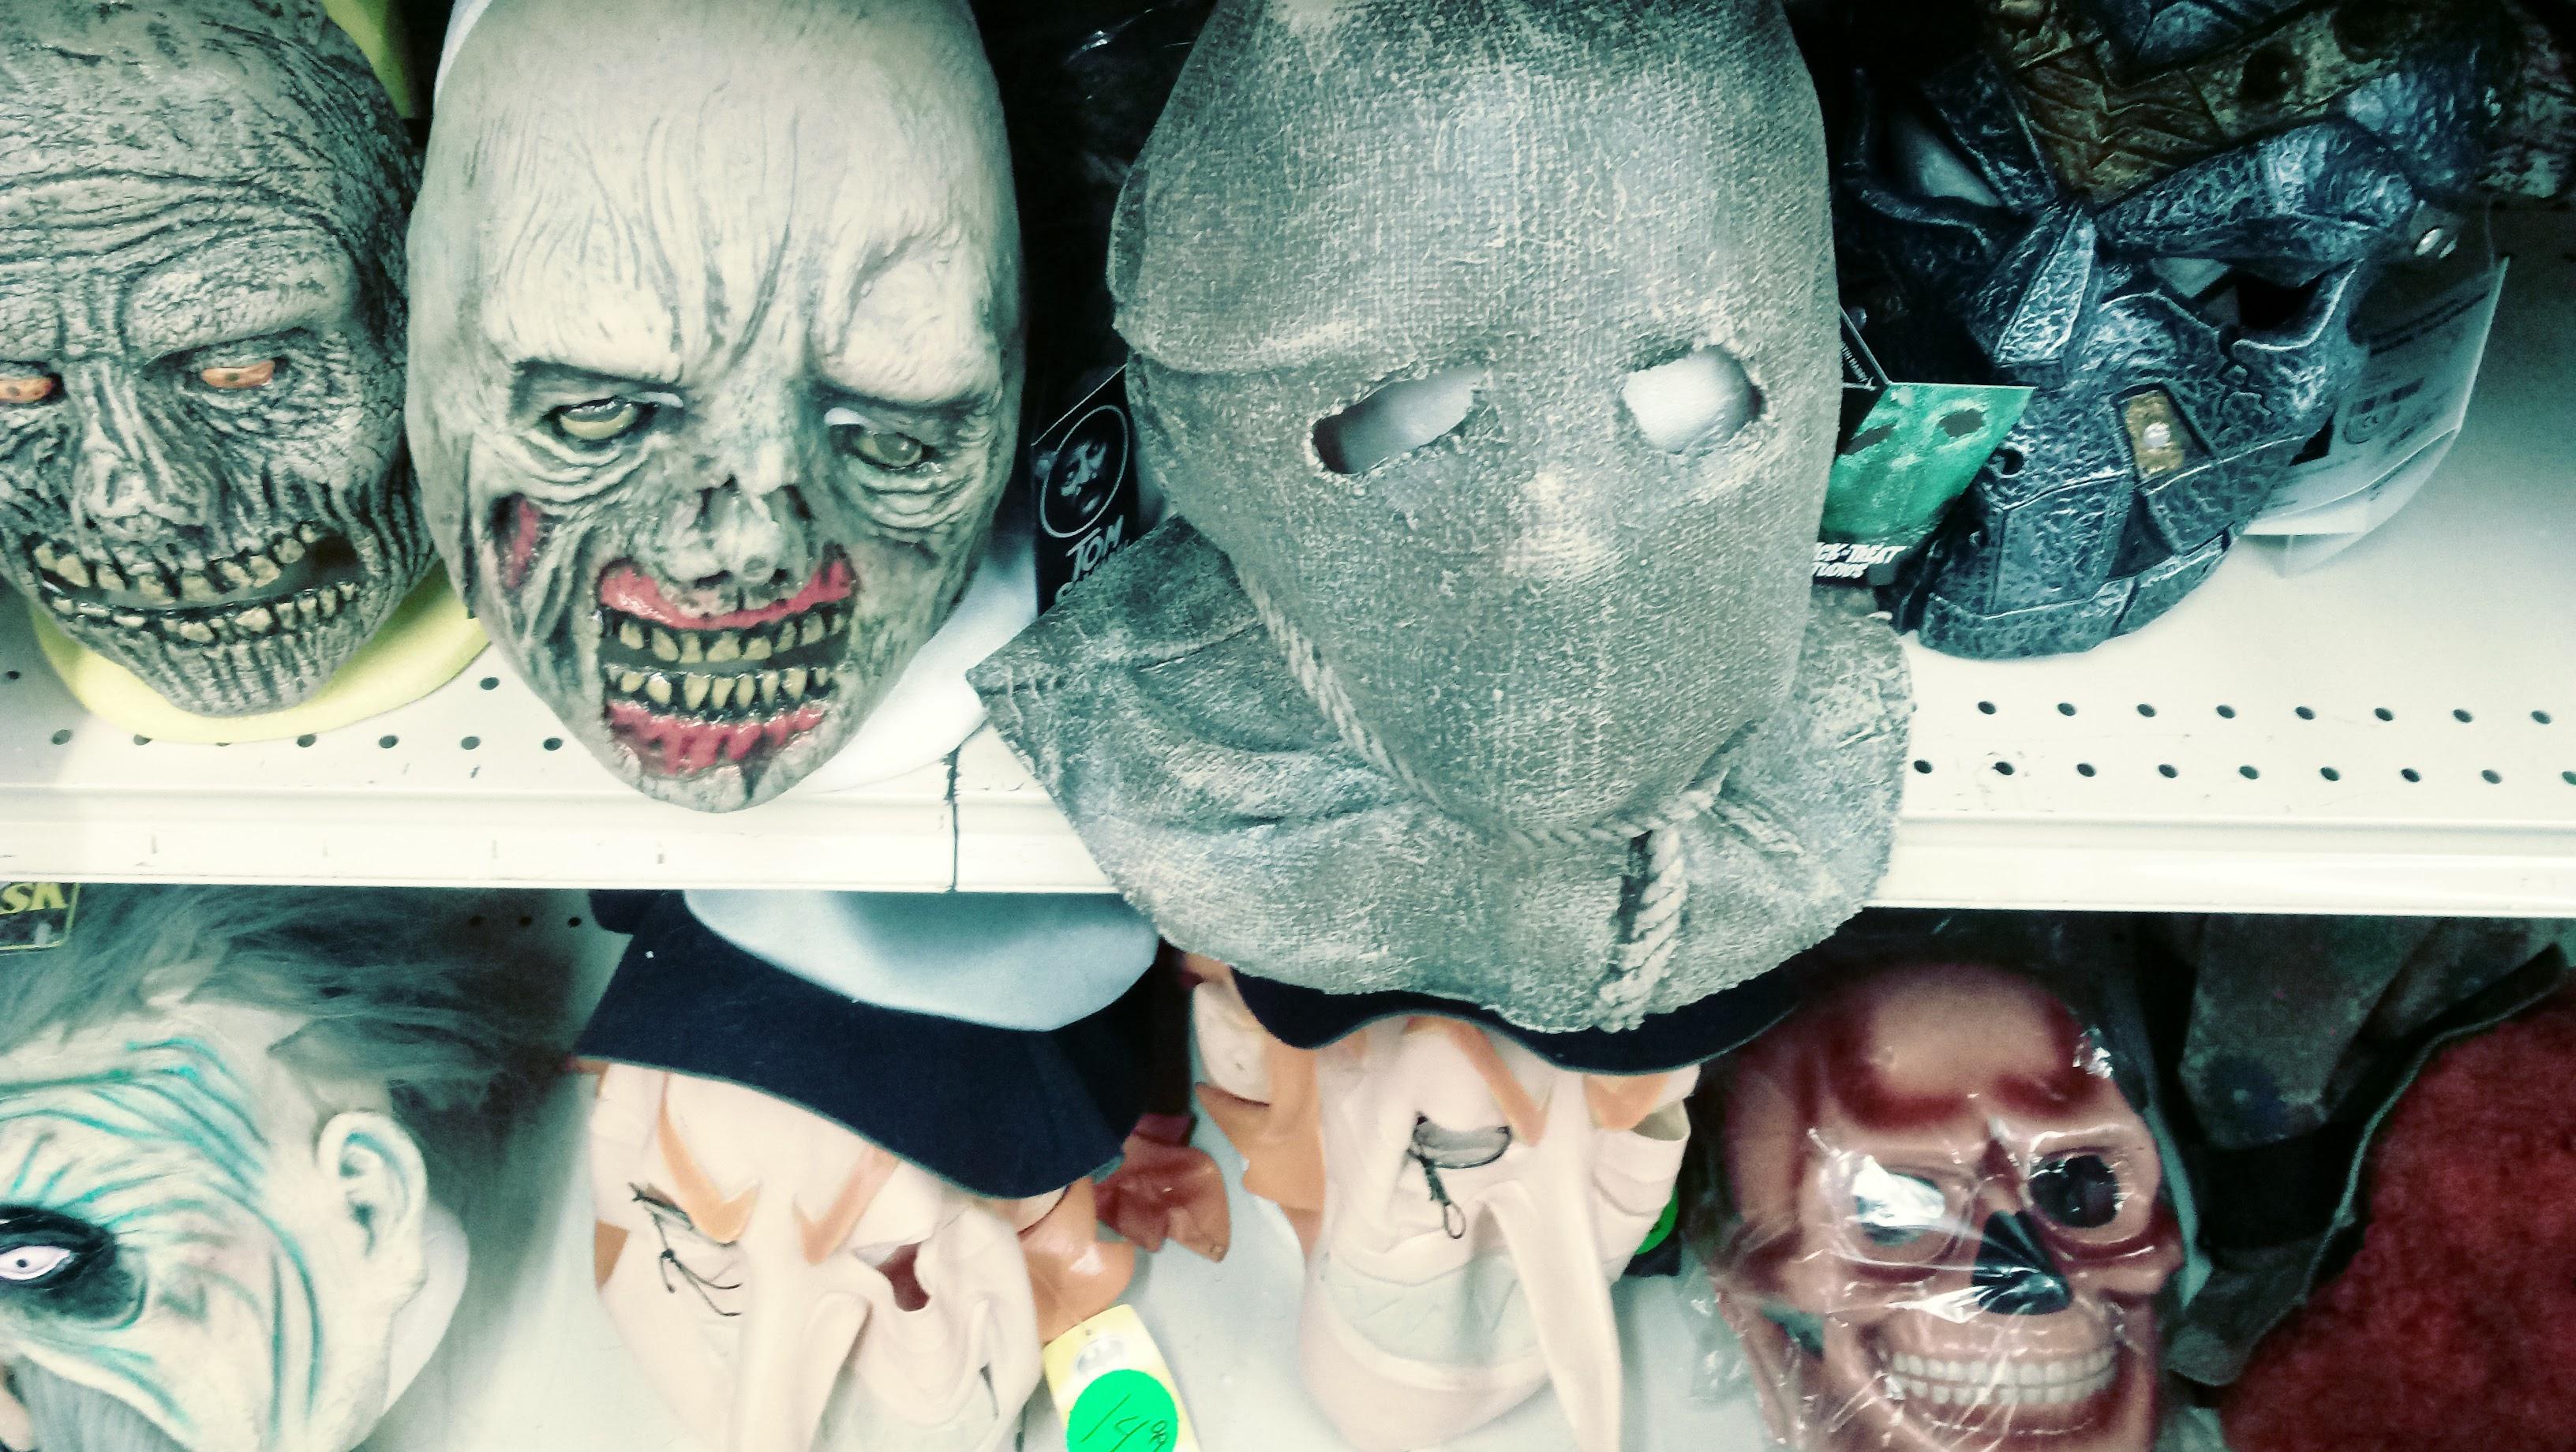 nick nackery evil knight leprechaun scarecrow and zombie masks